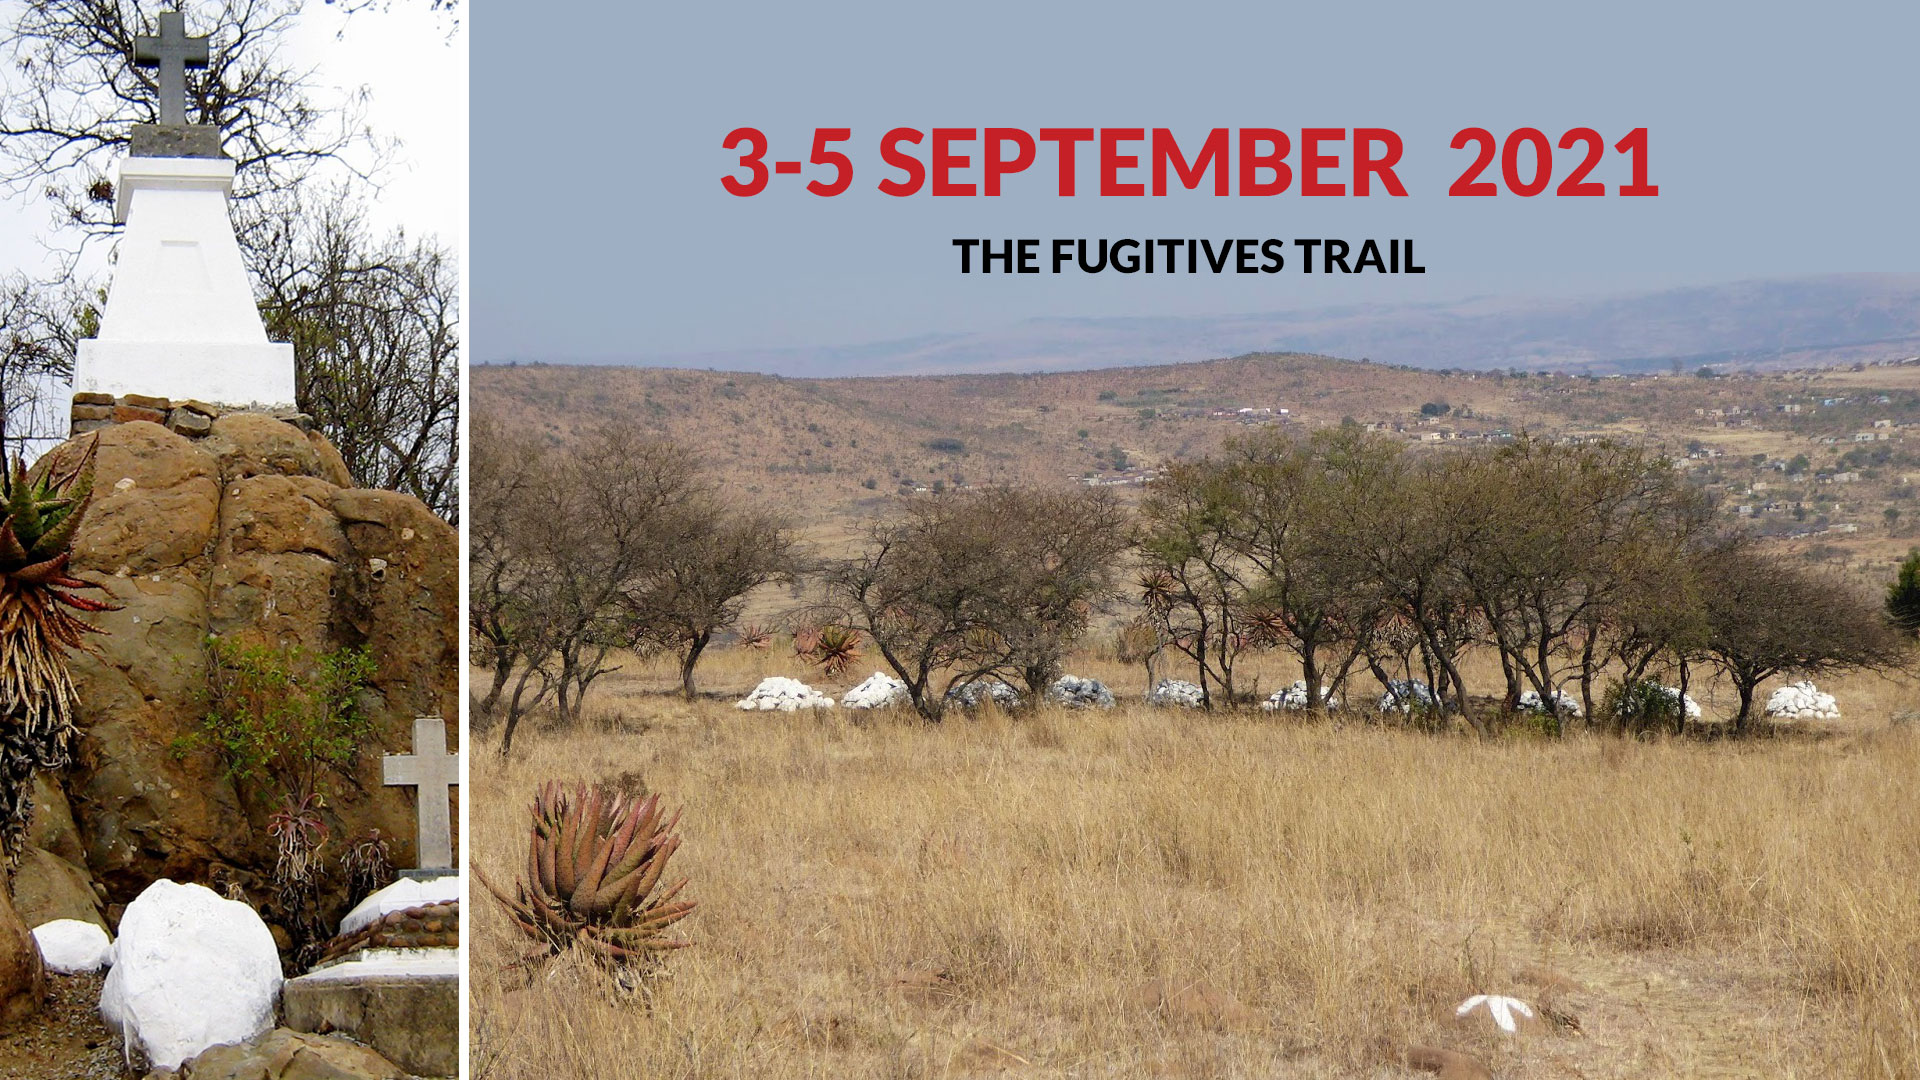 The Fugitives Trail